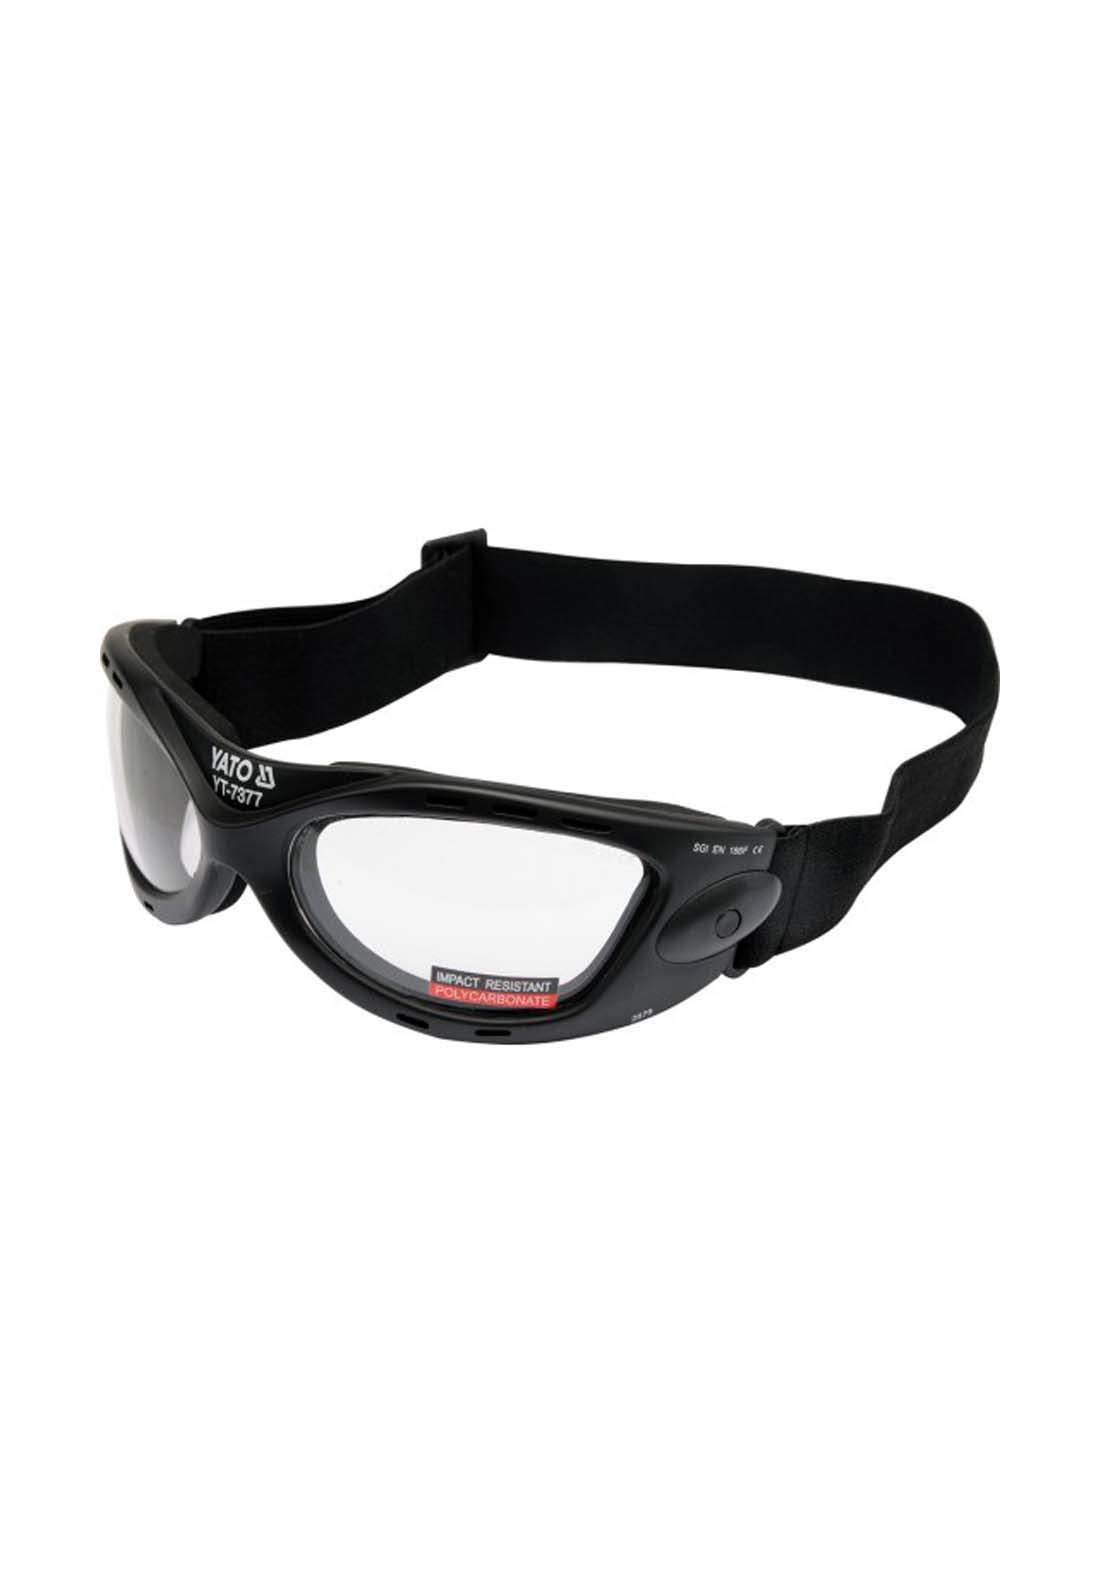 Yato YT-7377 Safety Glasses نظارة السلامة